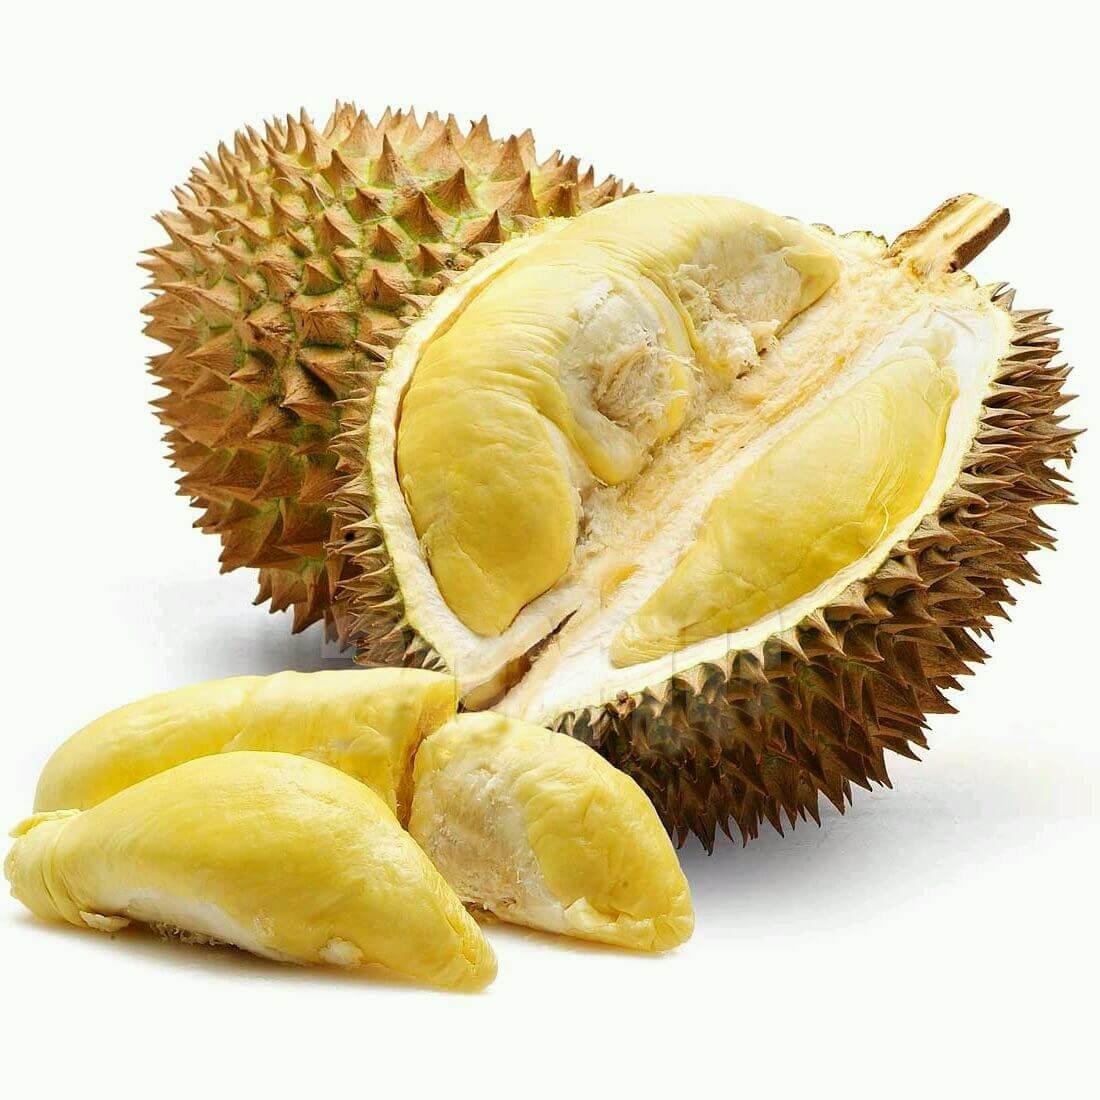 Manfaat Budidaya Durian